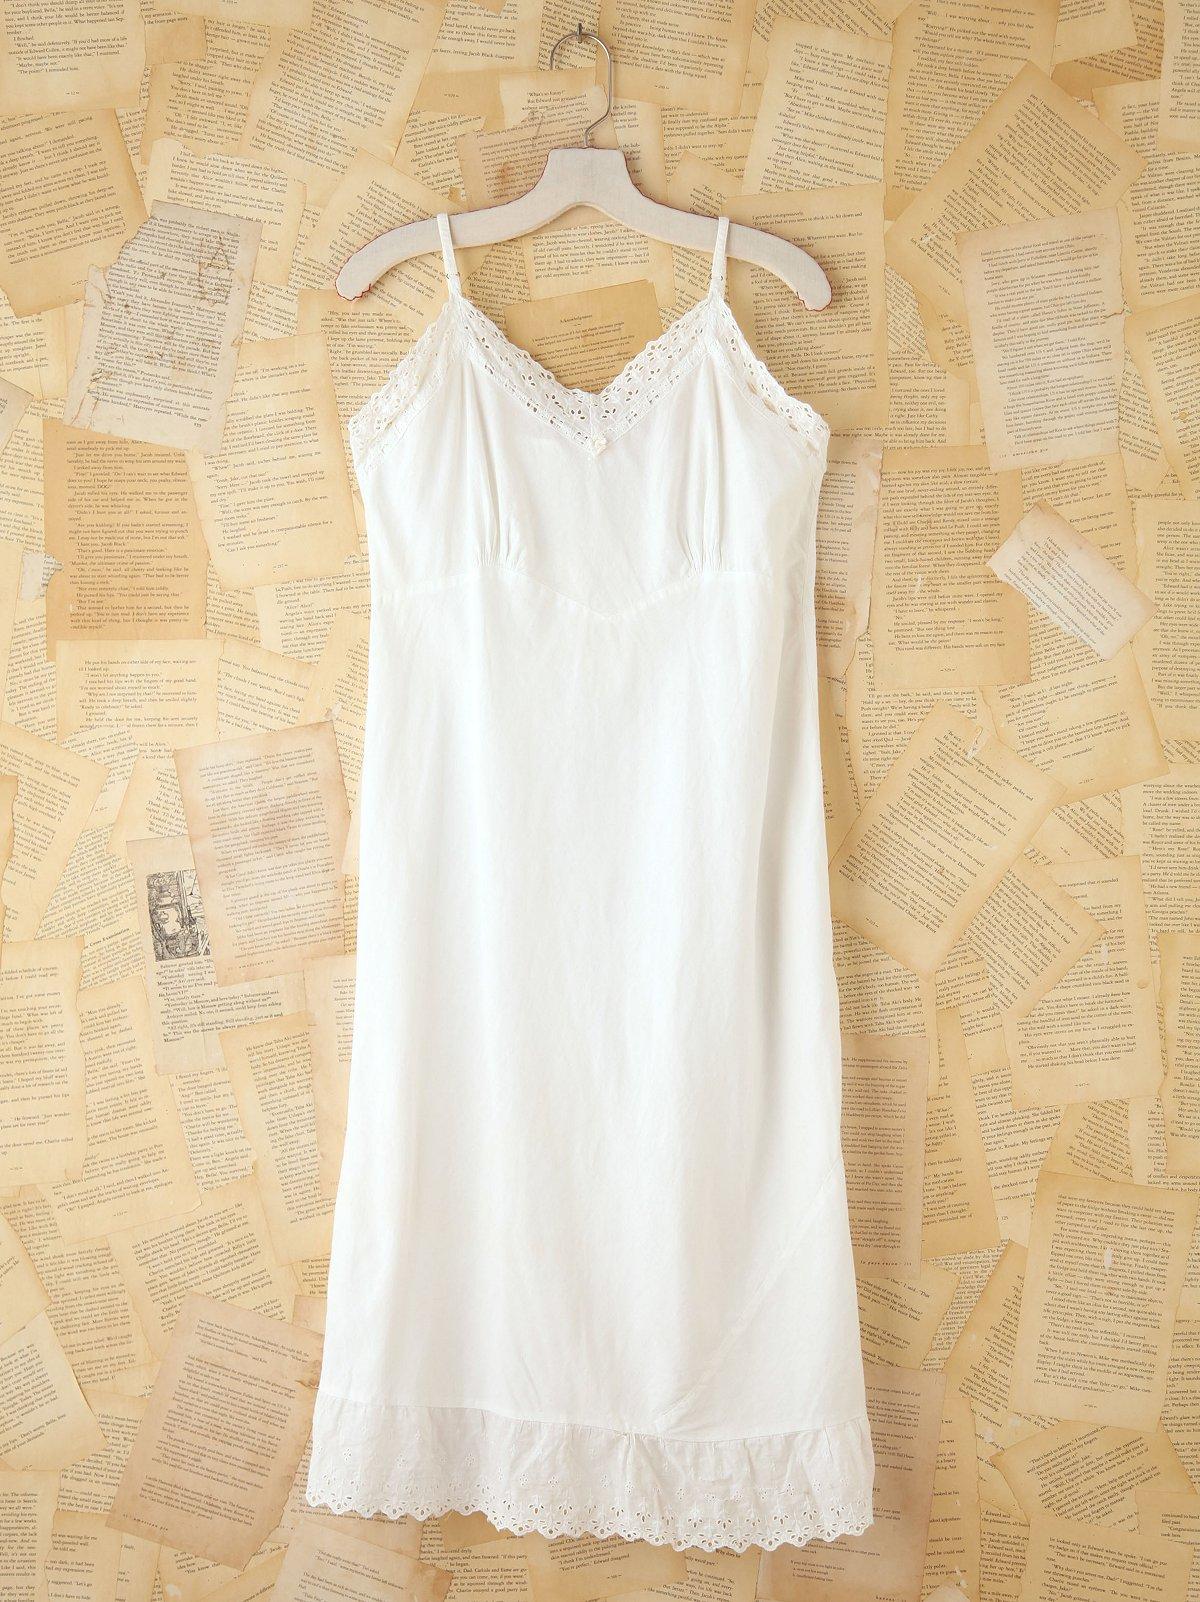 Vintage Sleeveless Nightgown